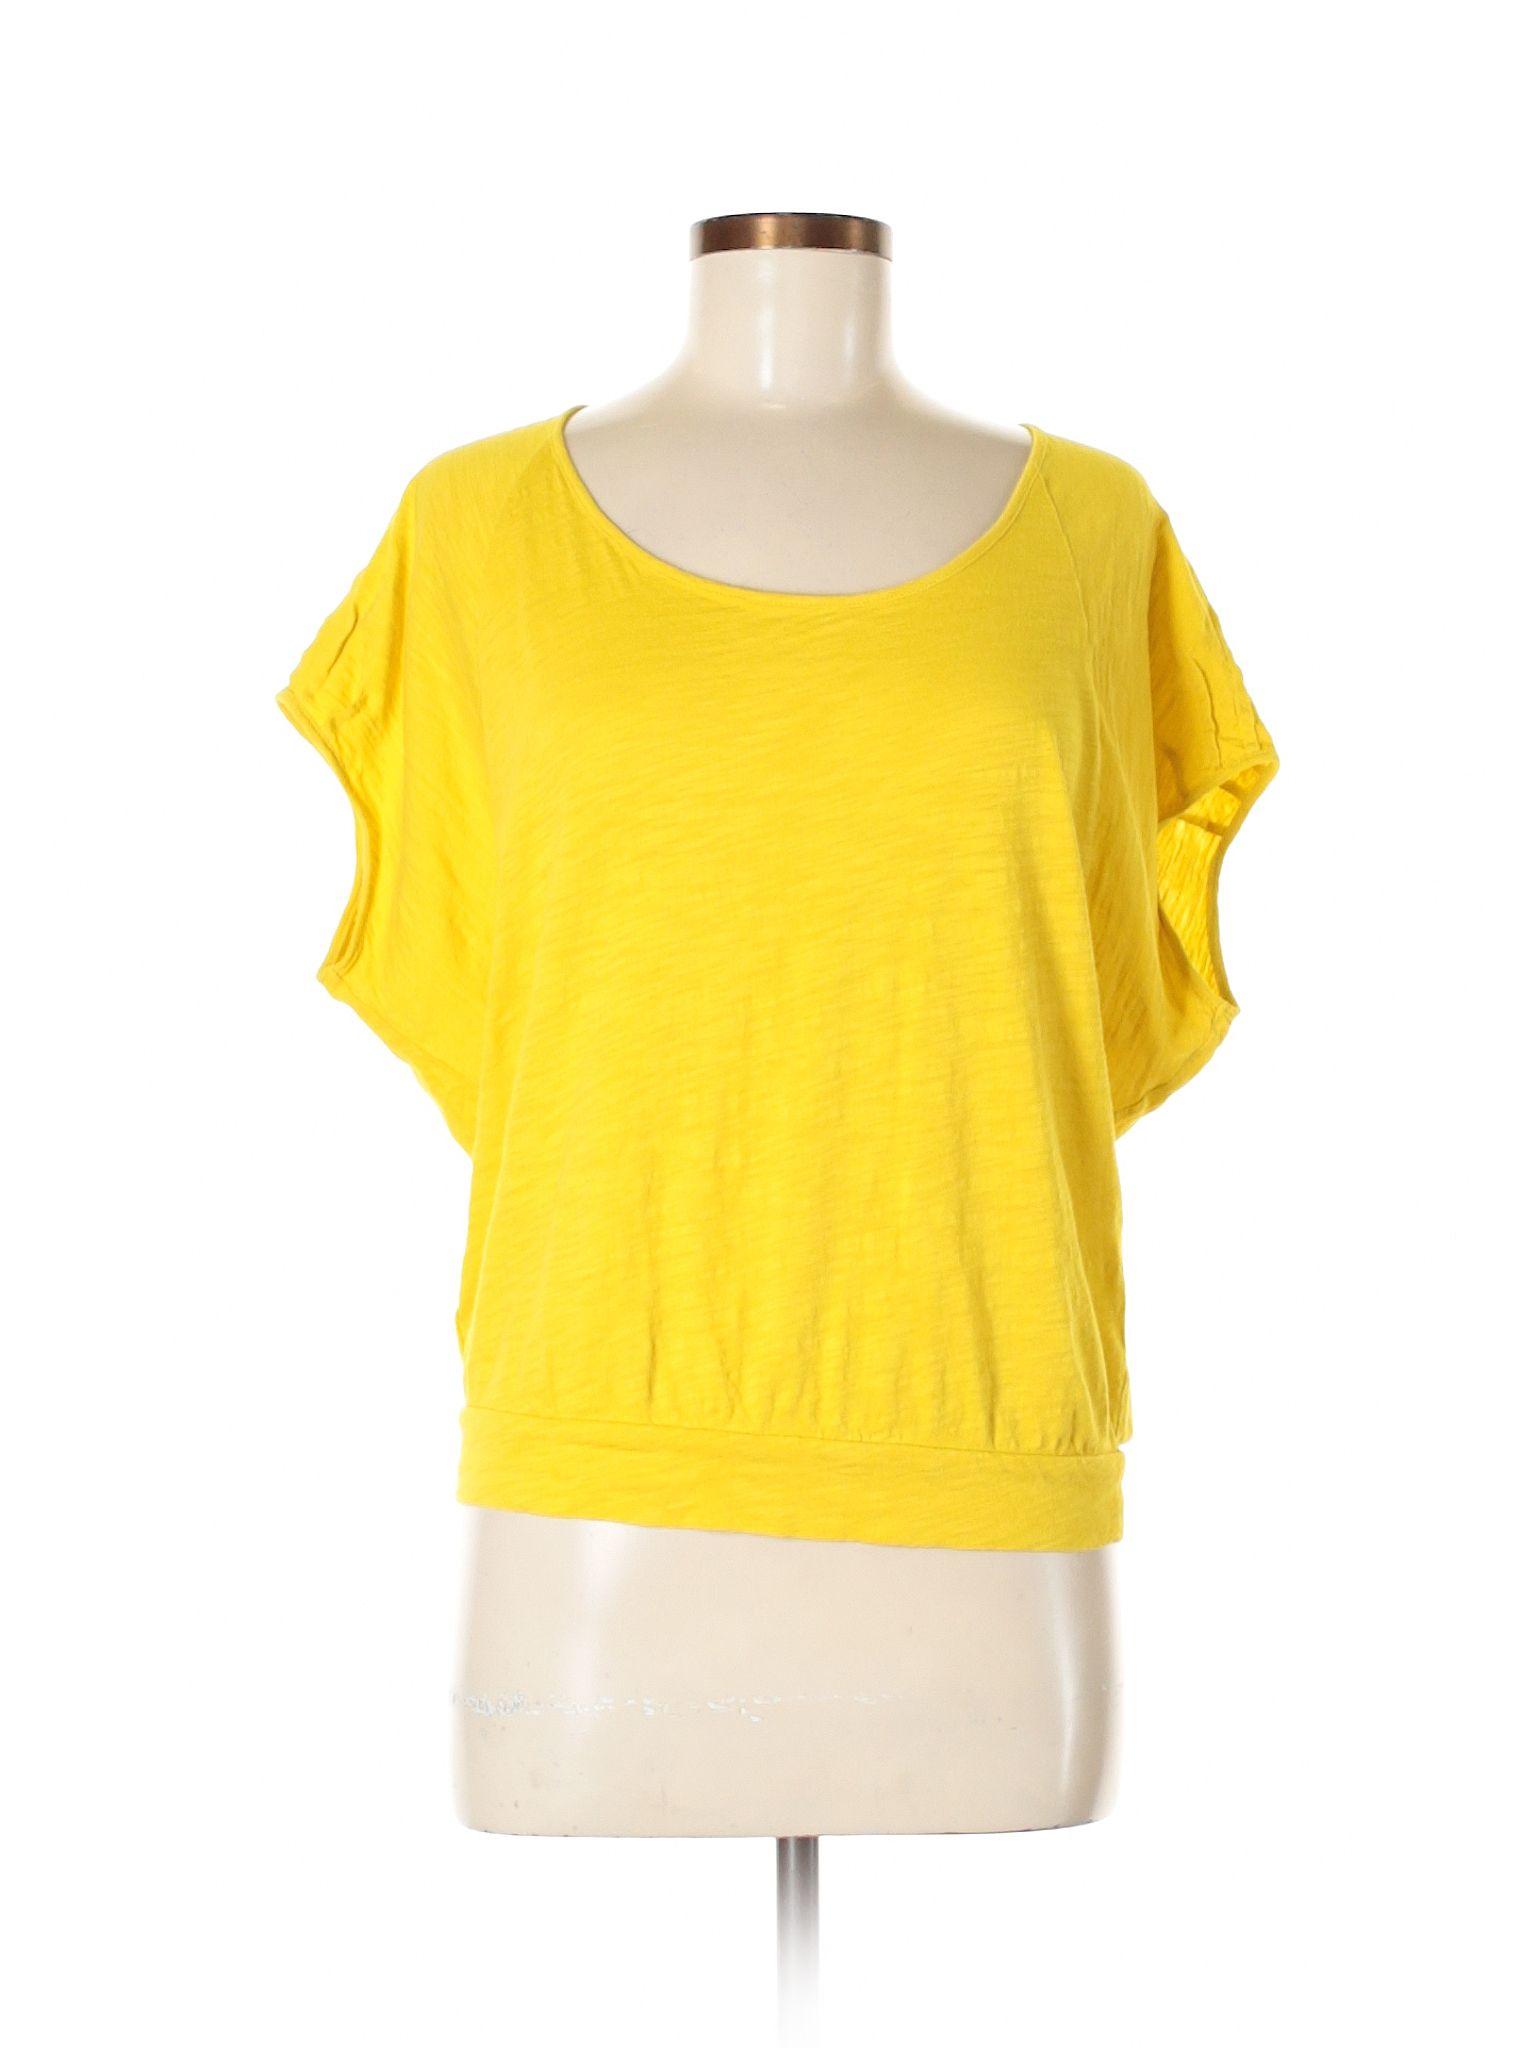 e5975c2bdbcfe Ann Taylor LOFT Short Sleeve T Shirt: Size 4.00 Dark Yellow Women's Tops -  $6.99